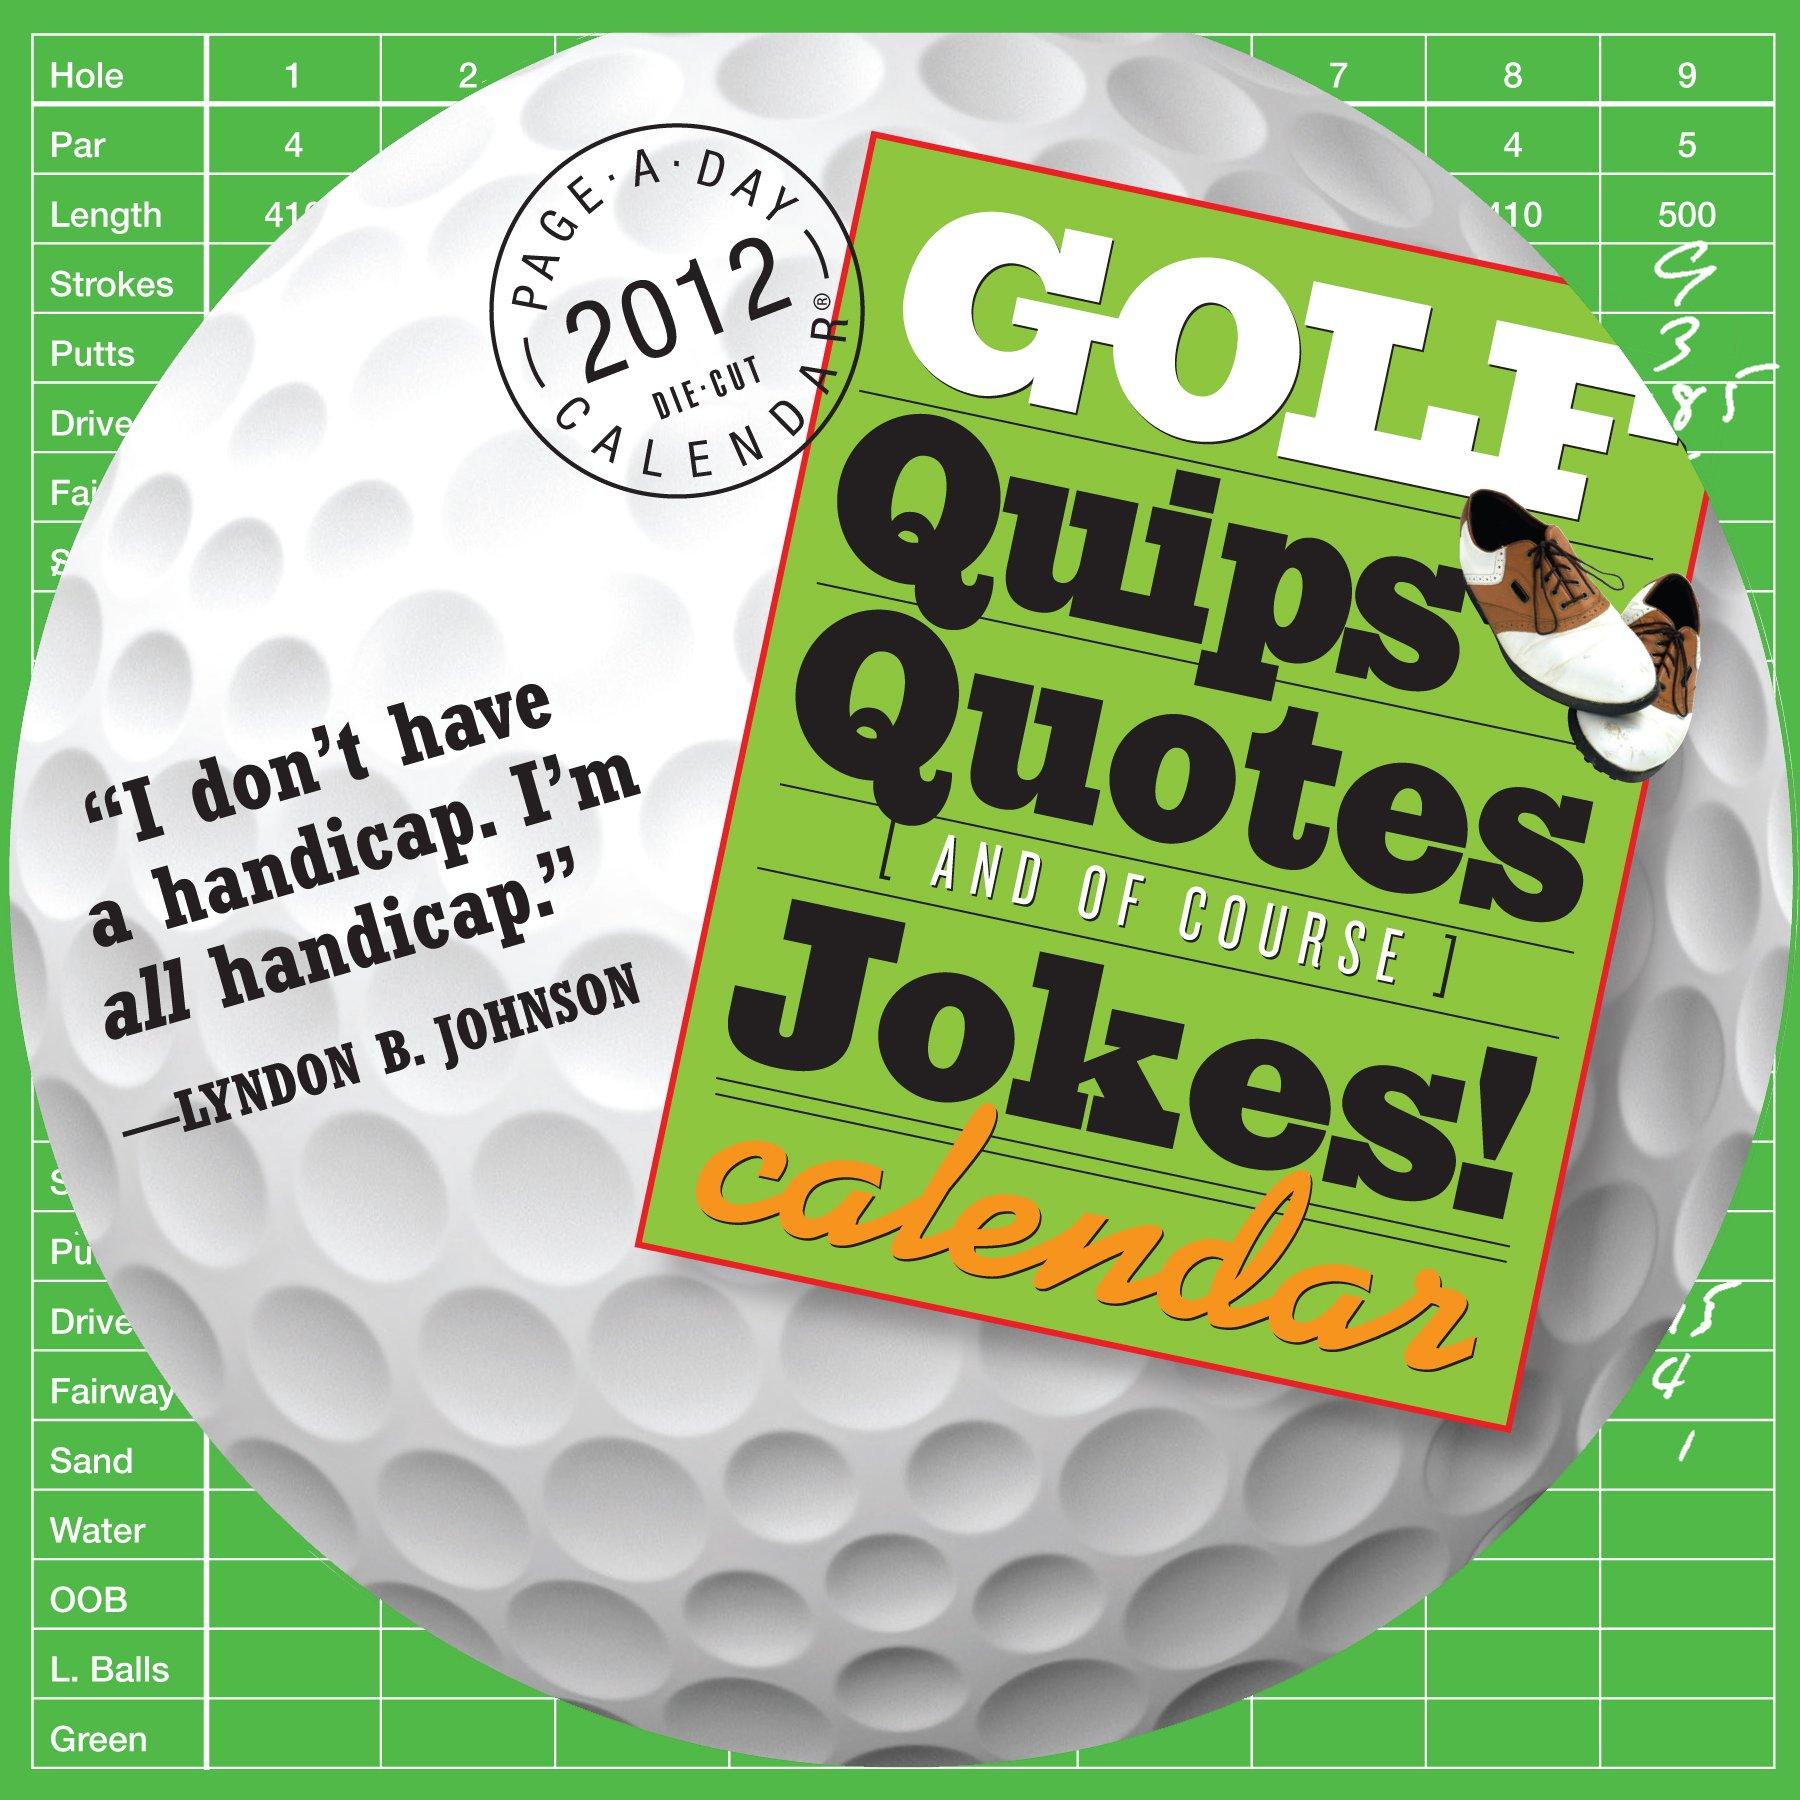 Golf Quips Quotes Jokes Calendar product image